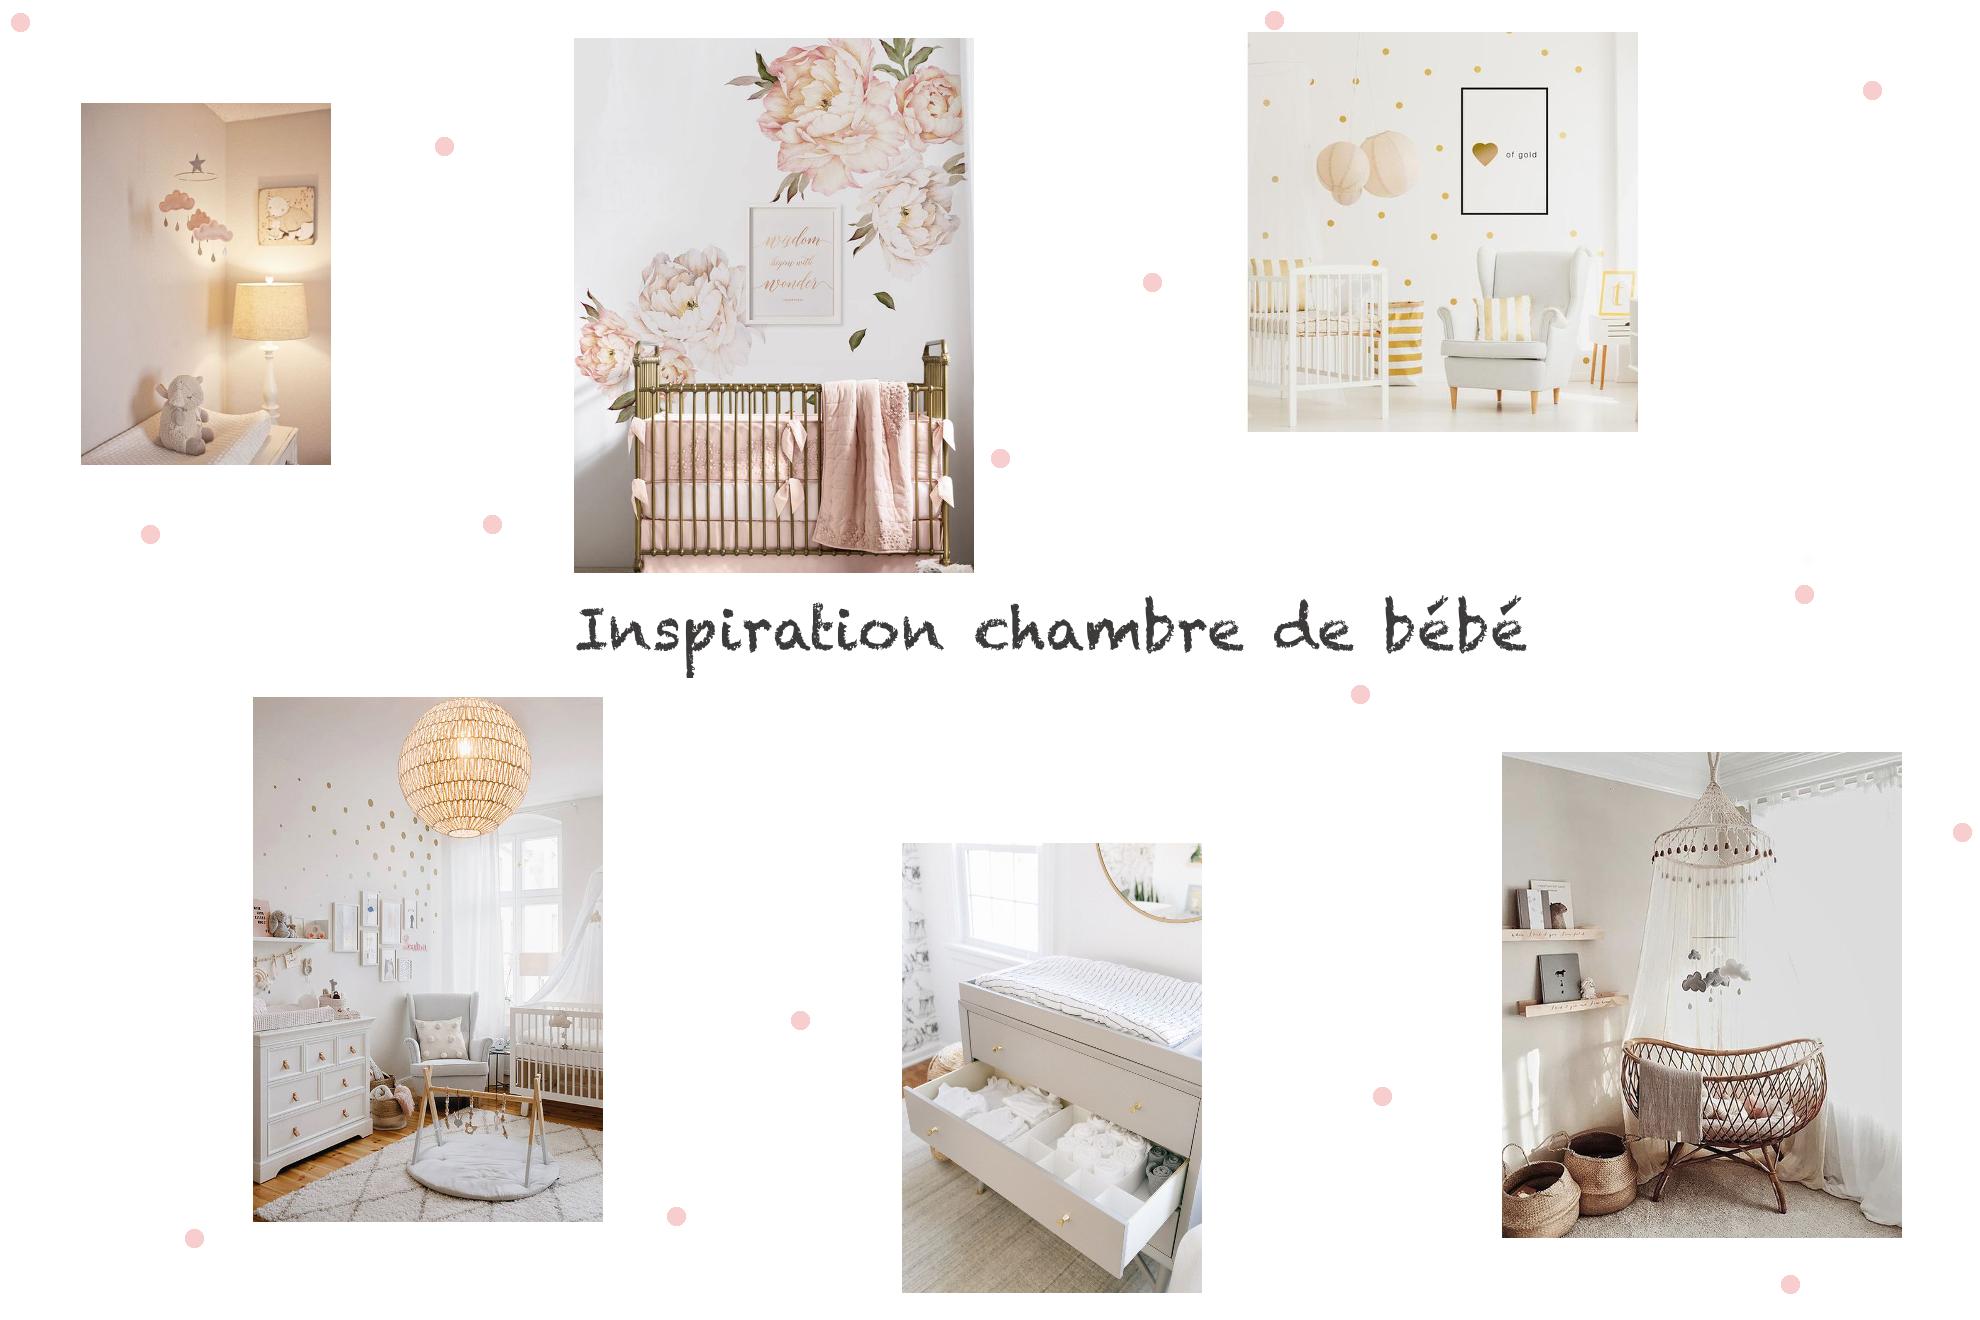 Inspiration chambre de b b delphine cosmetic diary - Inspiration chambre bebe ...